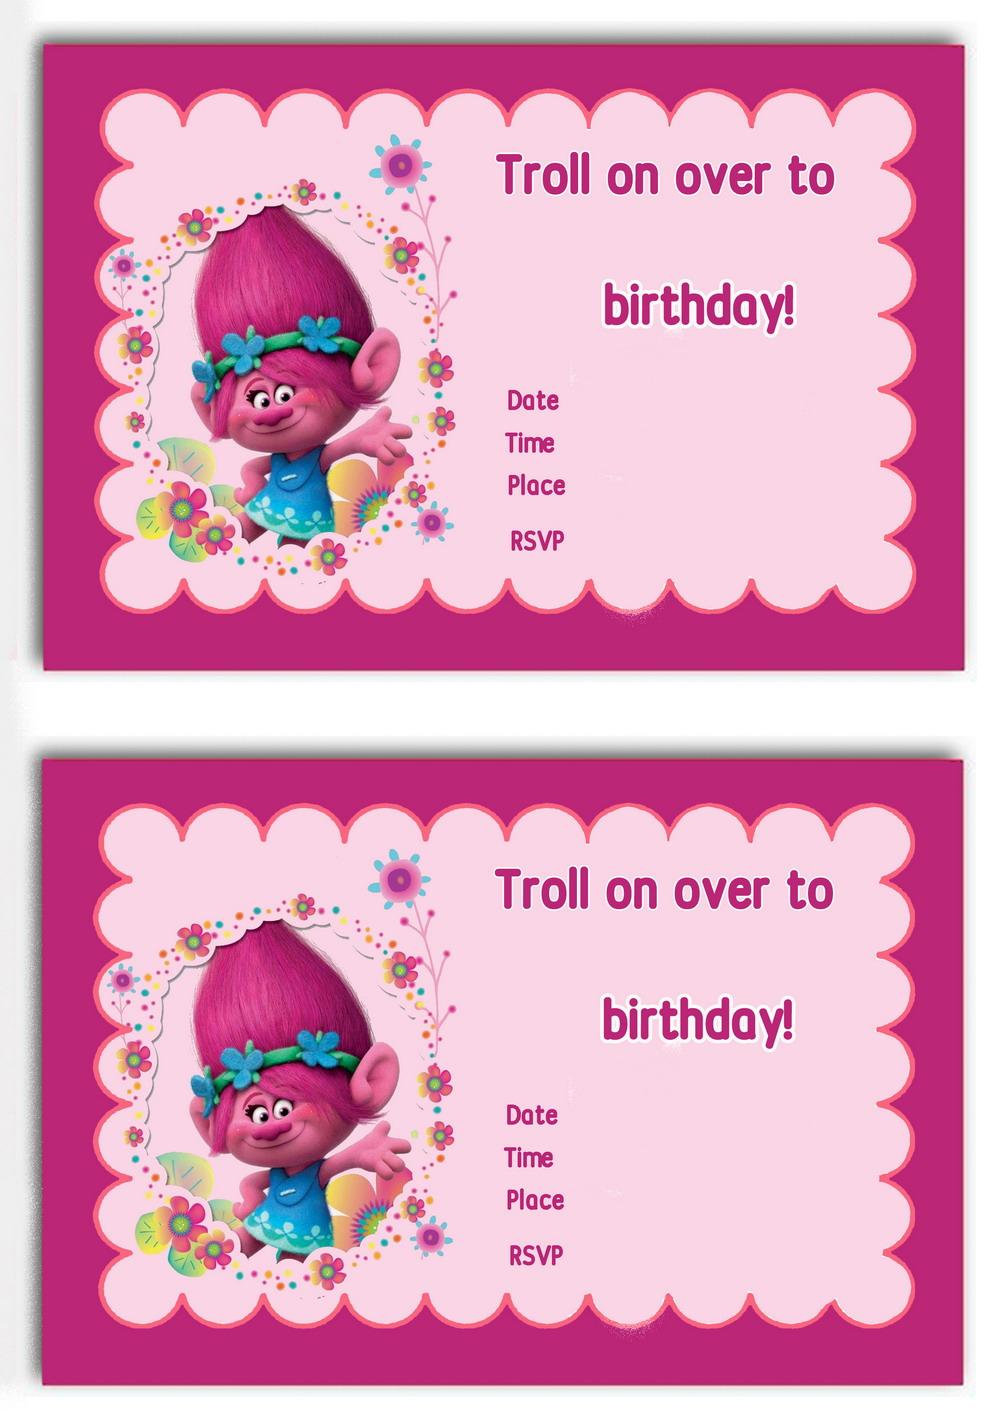 trolls holiday birthday invitations